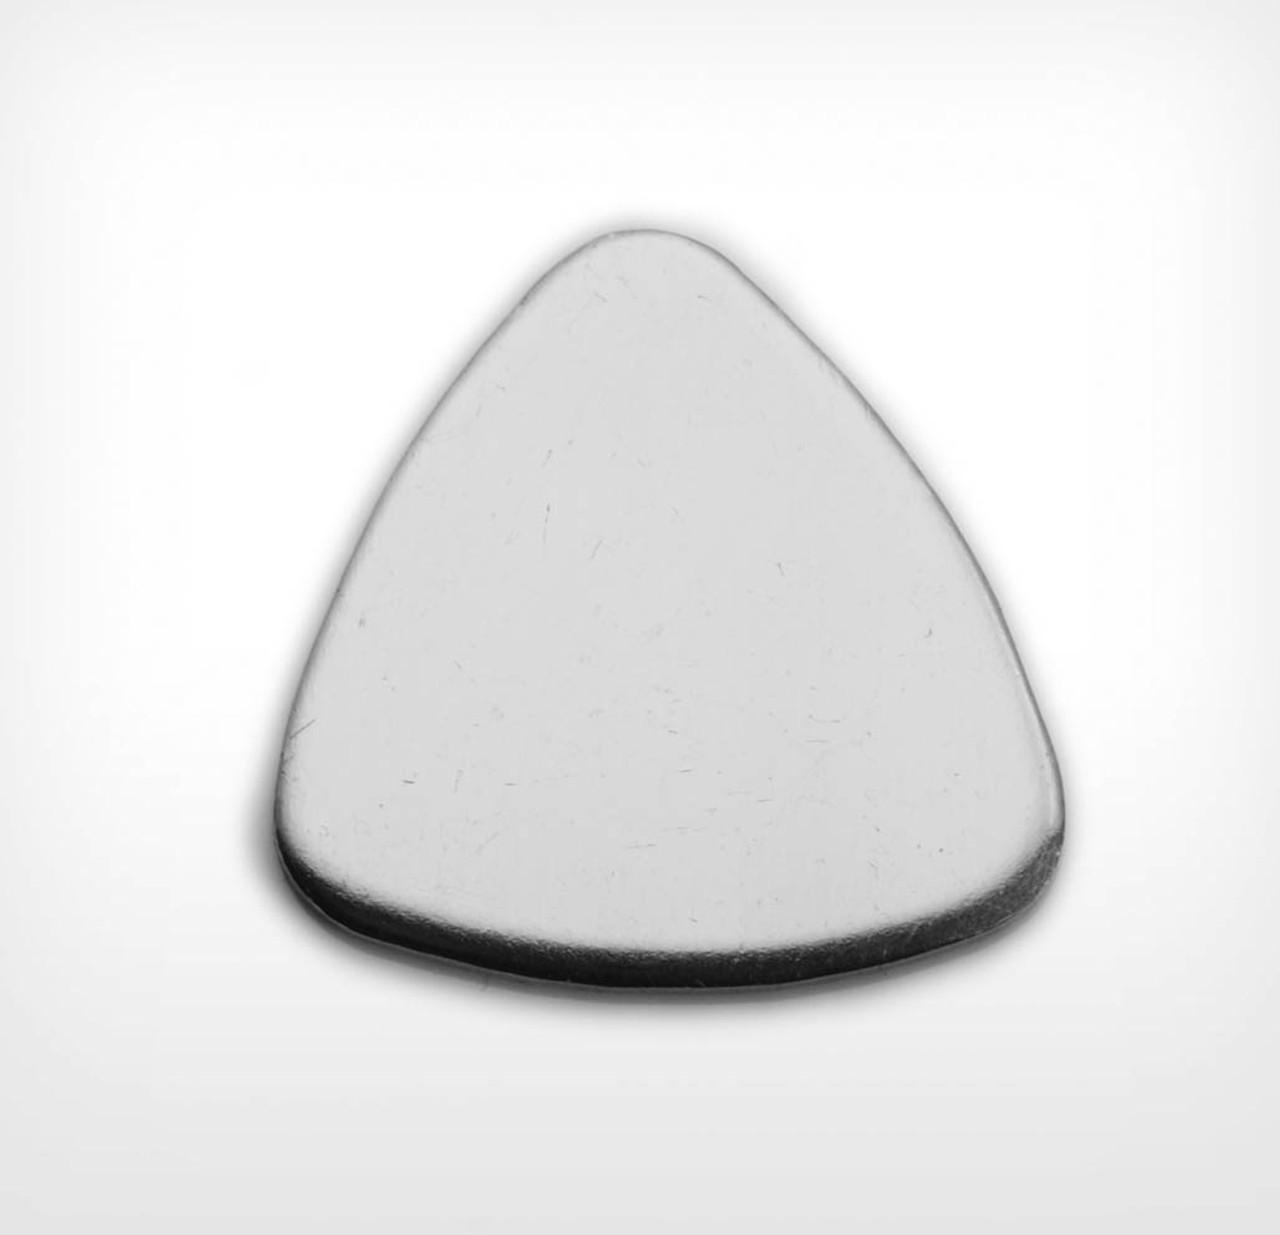 Aluminium Triangle, small - Pack of 10 (931-AL)